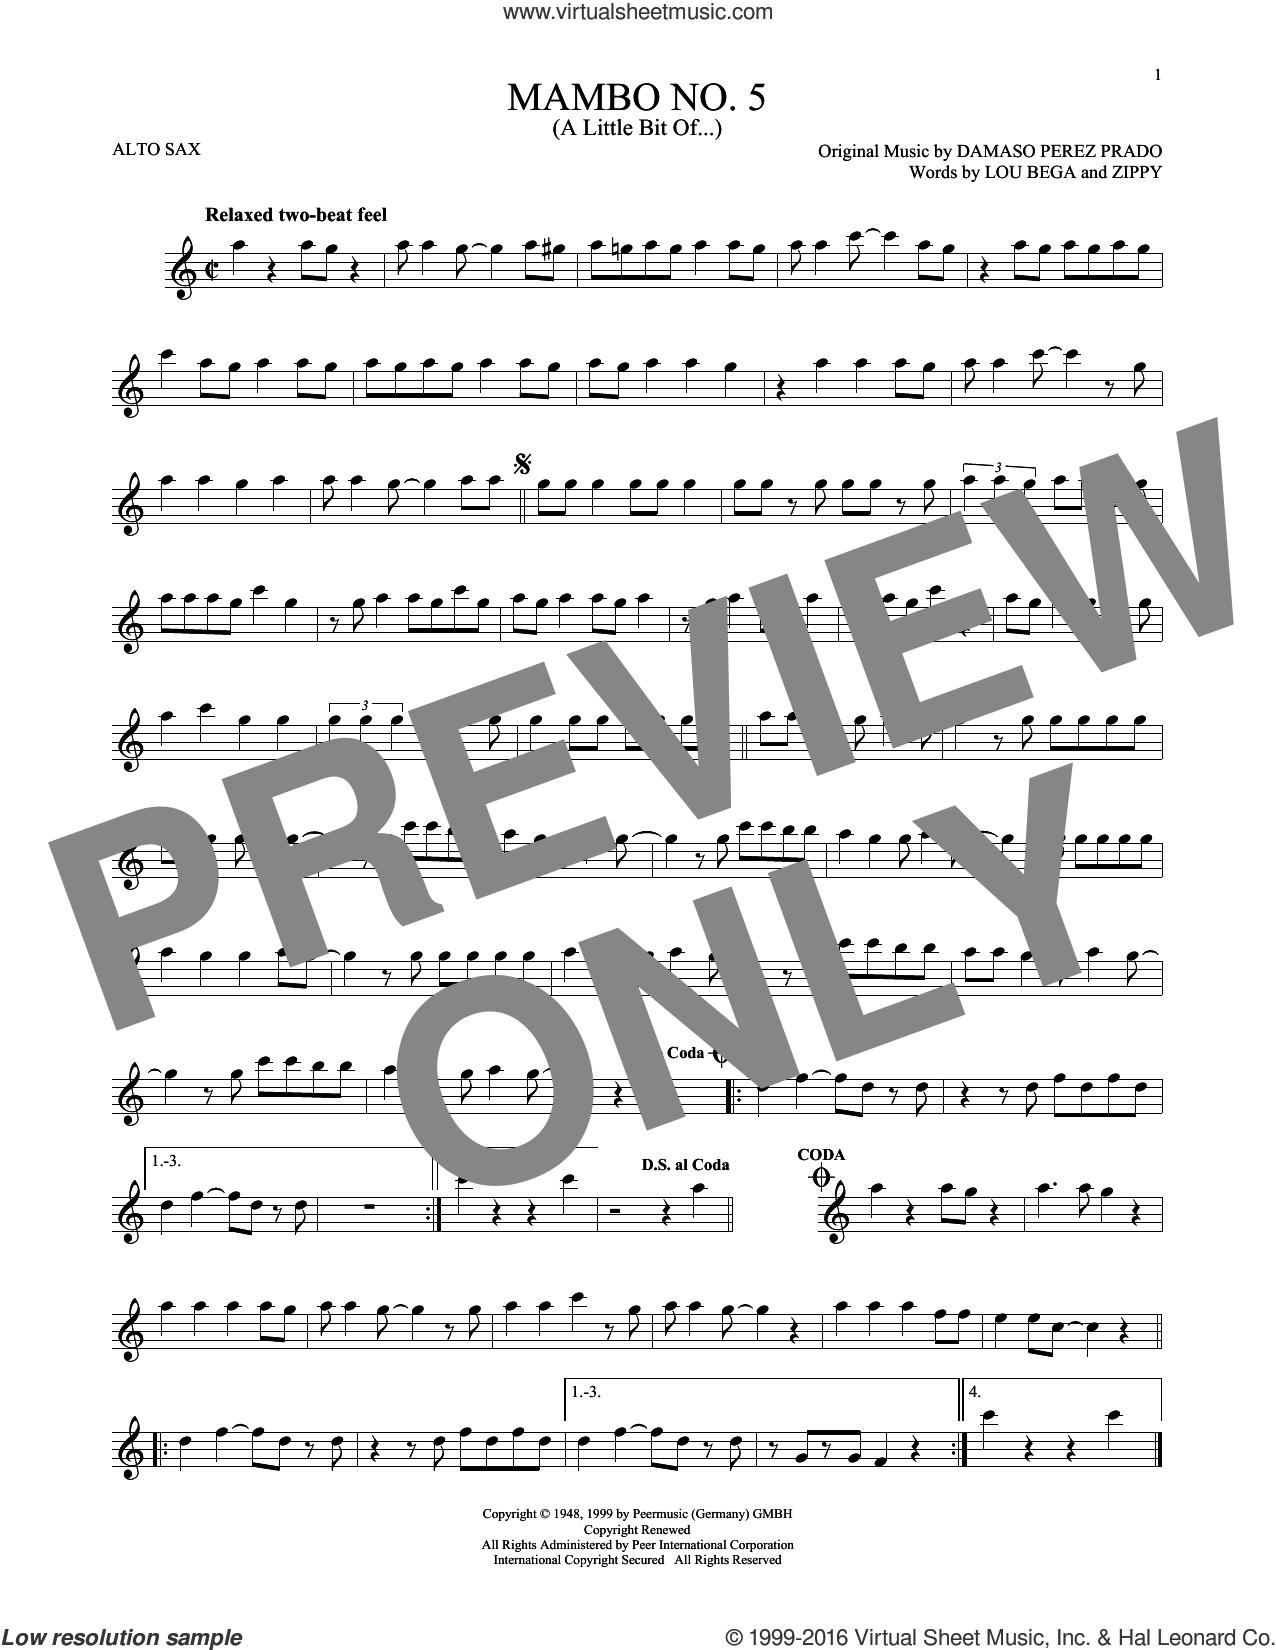 Mambo No. 5 (A Little Bit Of...) sheet music for alto saxophone solo by Lou Bega, Damaso Perez Prado and Zippy, intermediate skill level